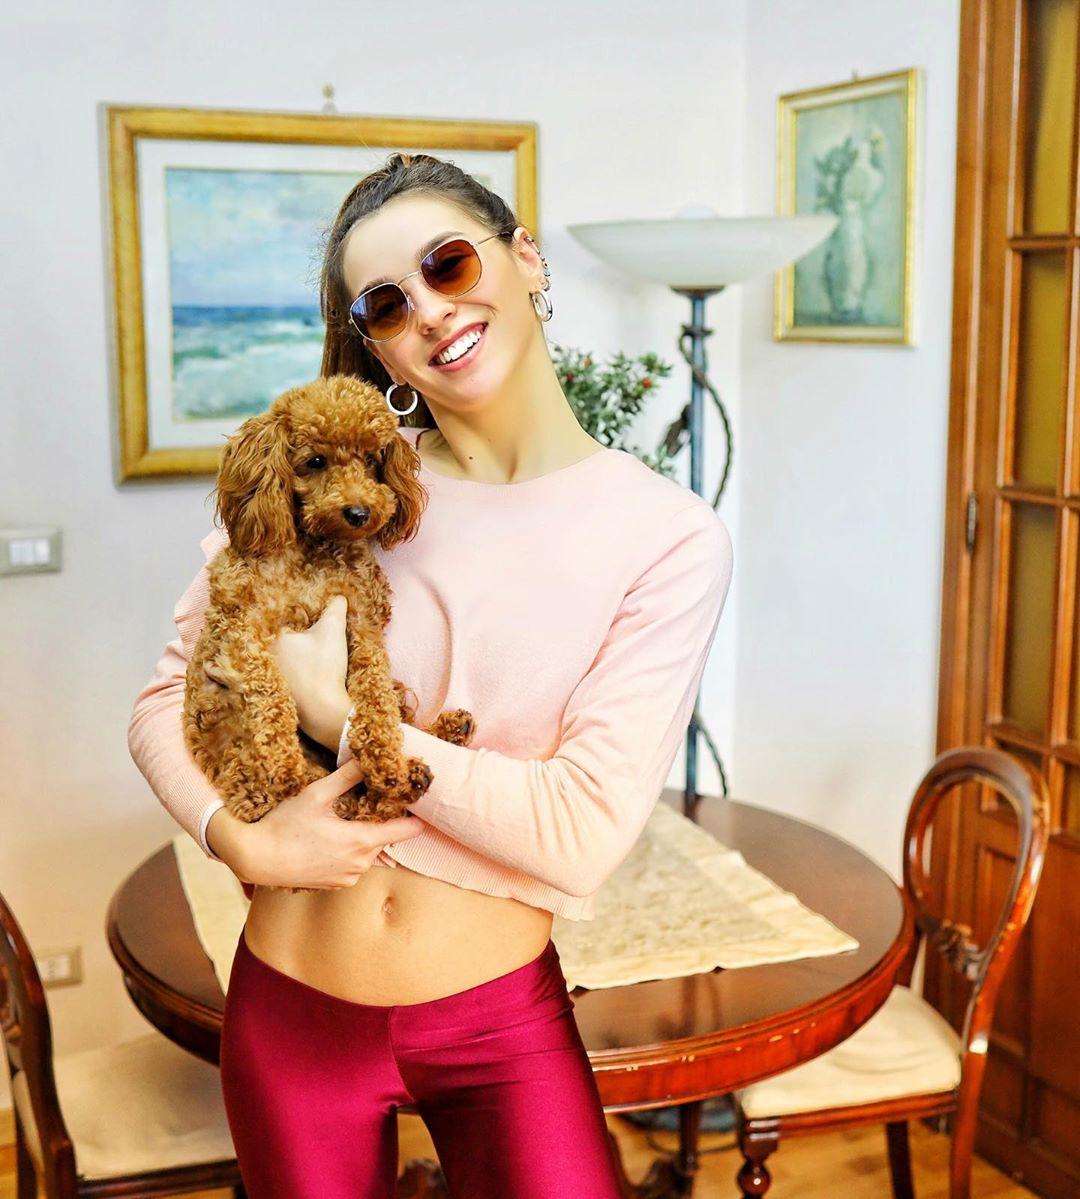 Ginevra Pisani, instagramers e influencer itlaliana